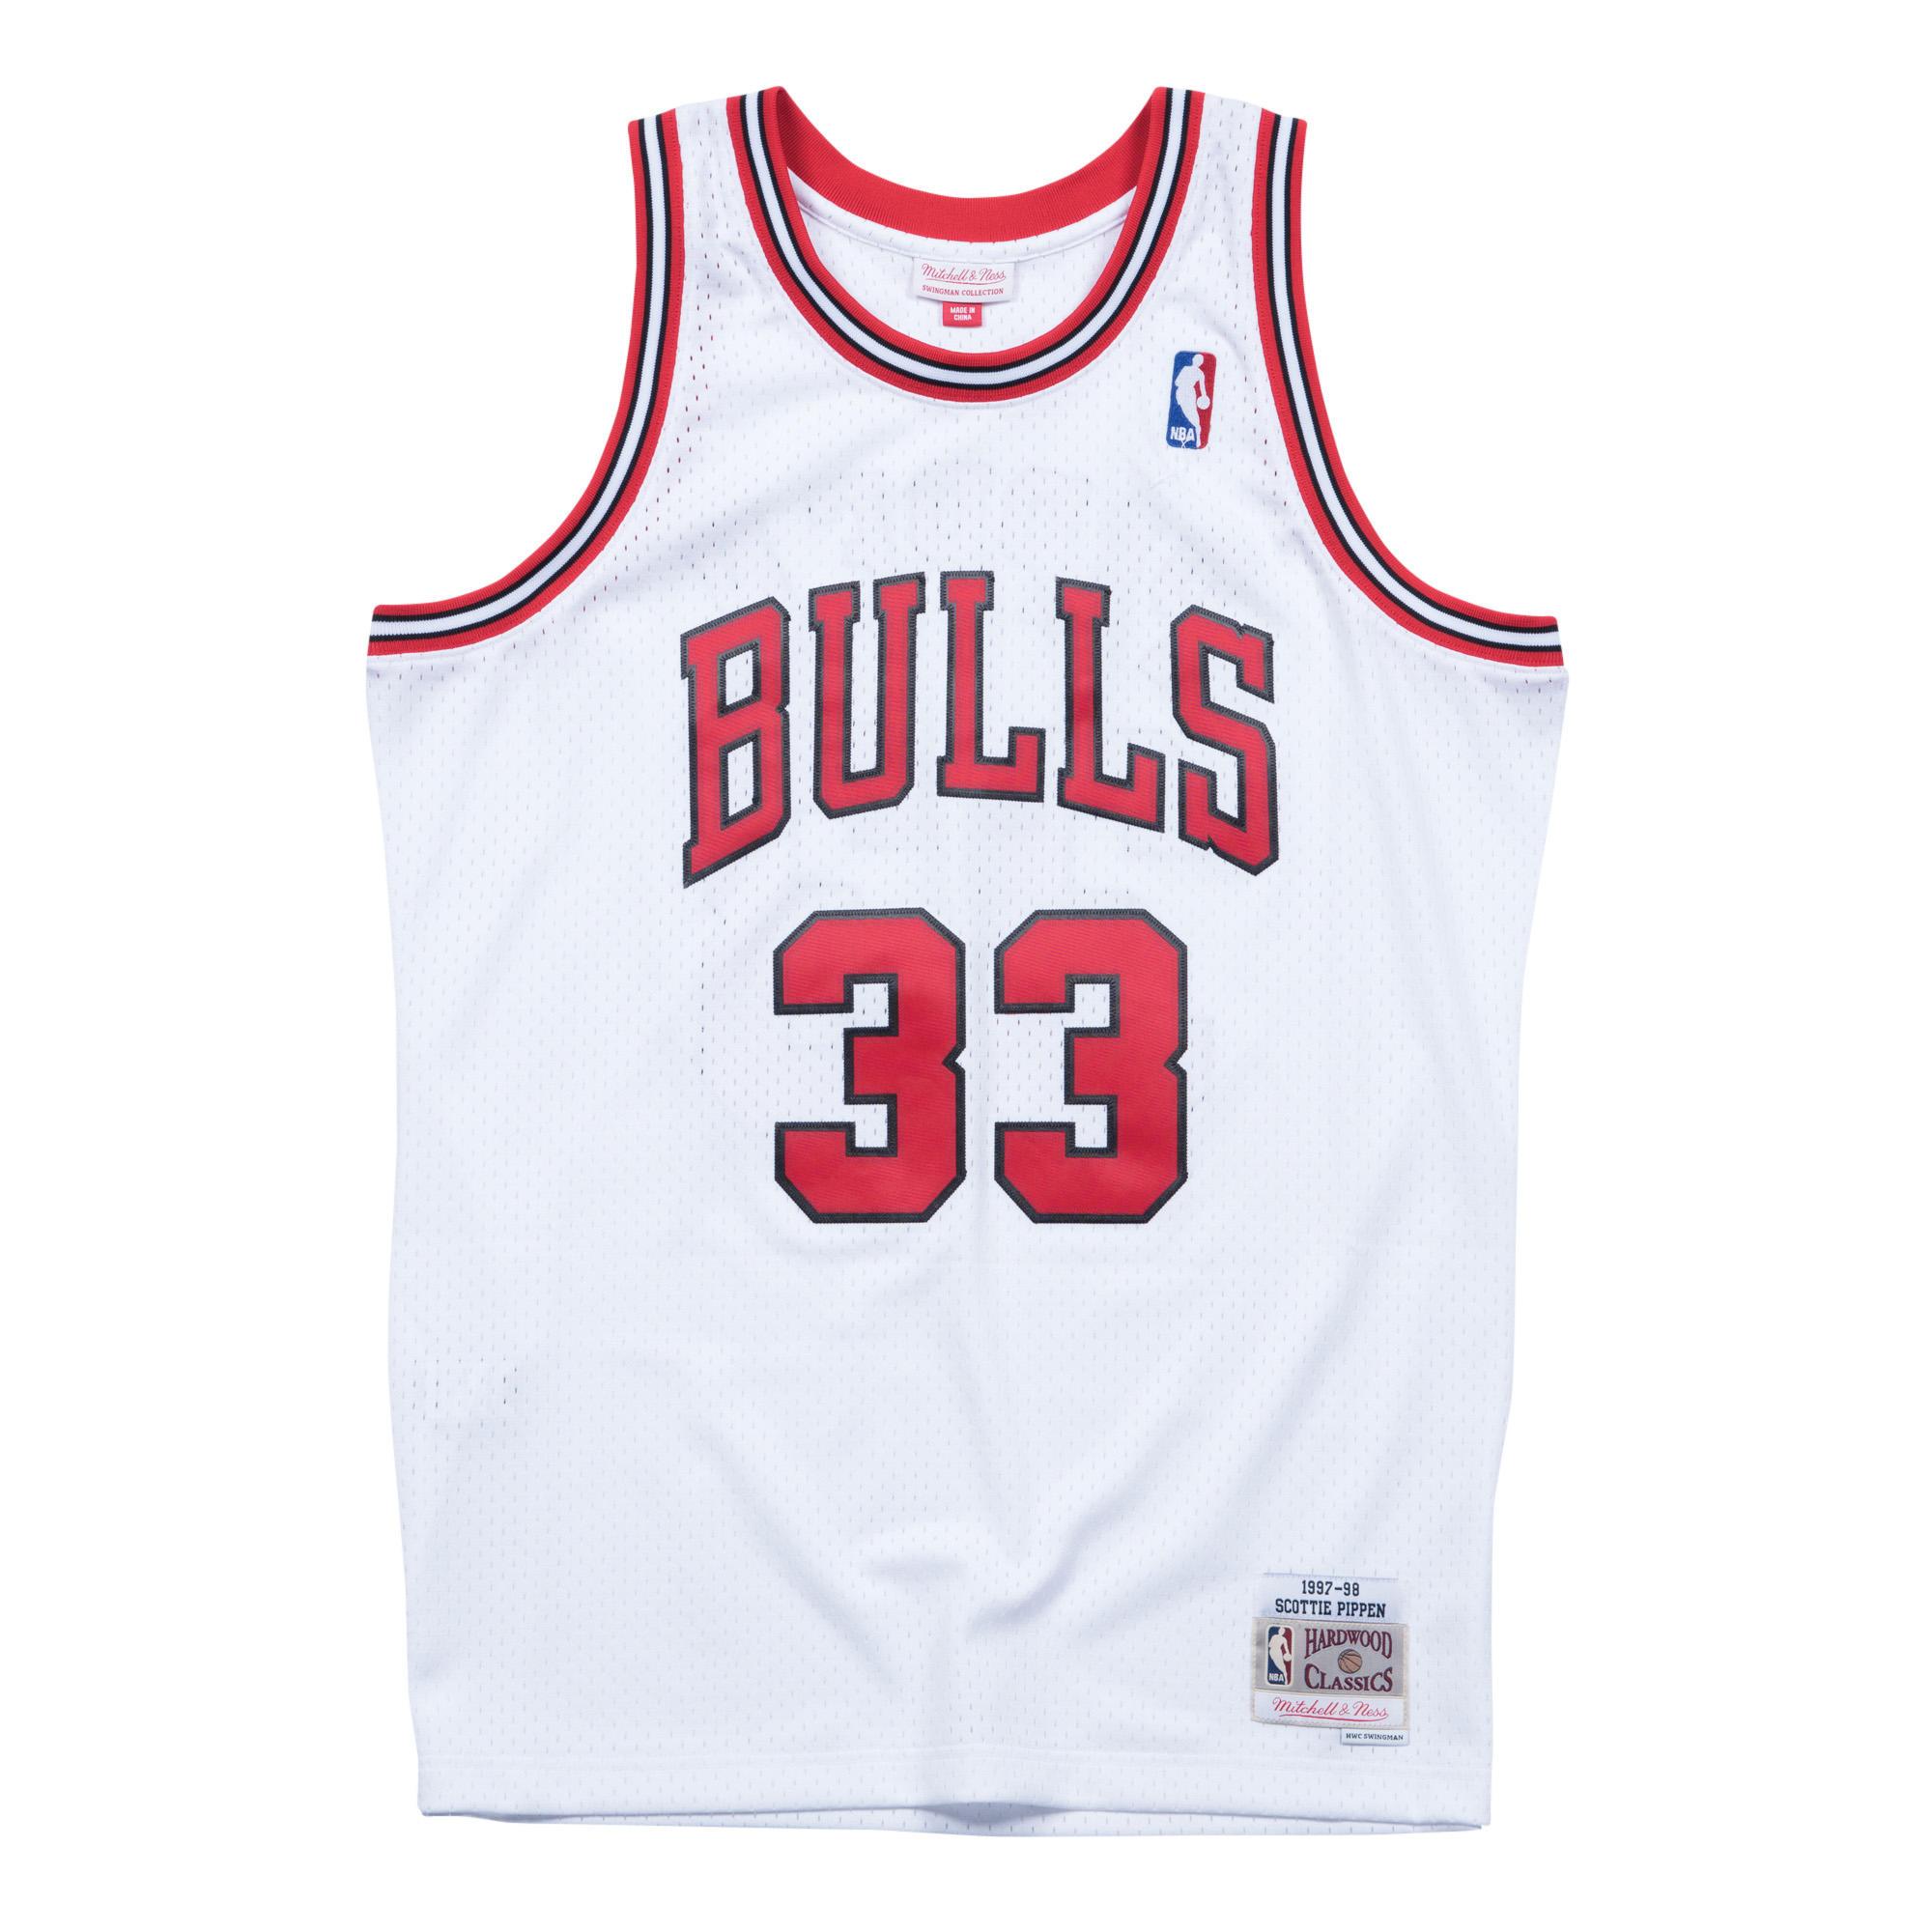 b63da56b174 Scottie Pippen 1997-98 Home Swingman Jersey Chicago Bulls